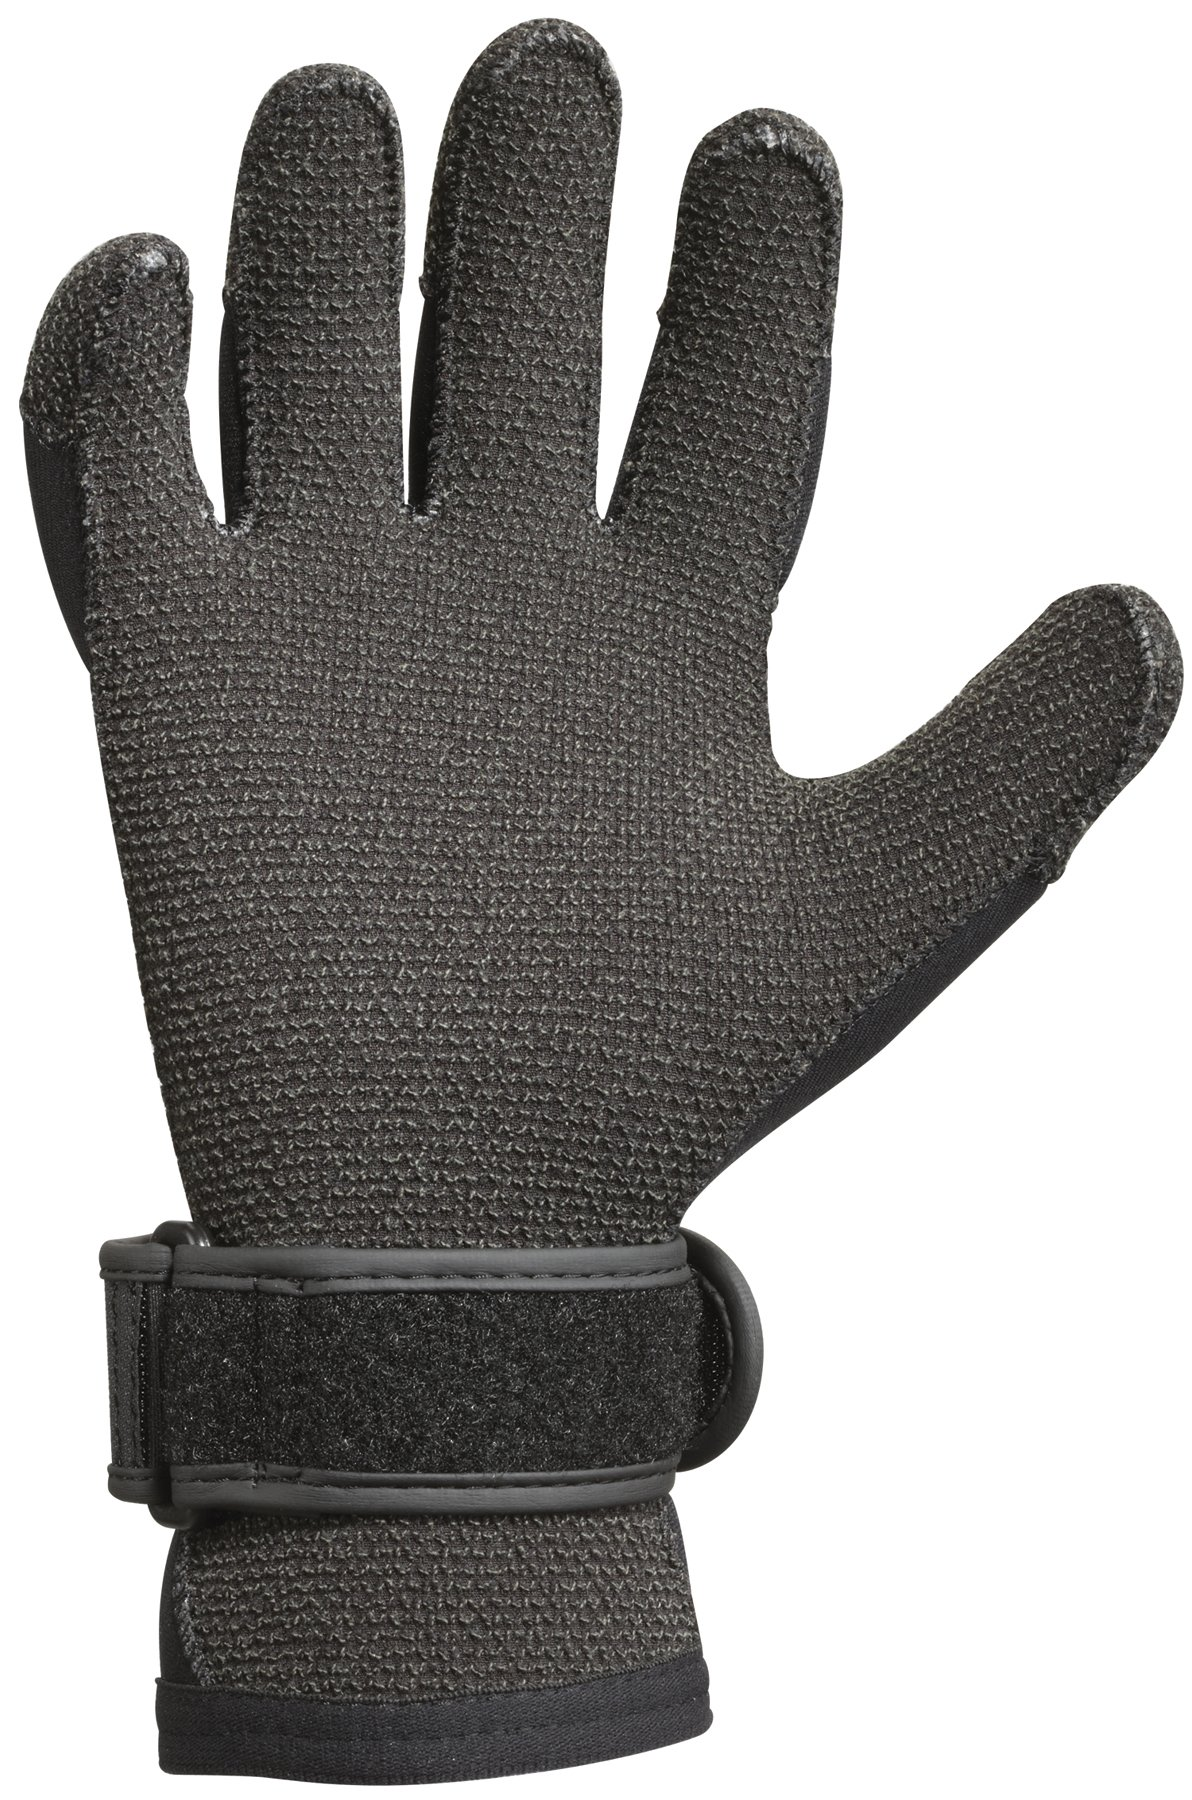 AKONA 5mm ArmorTex Dive Gloves, Large